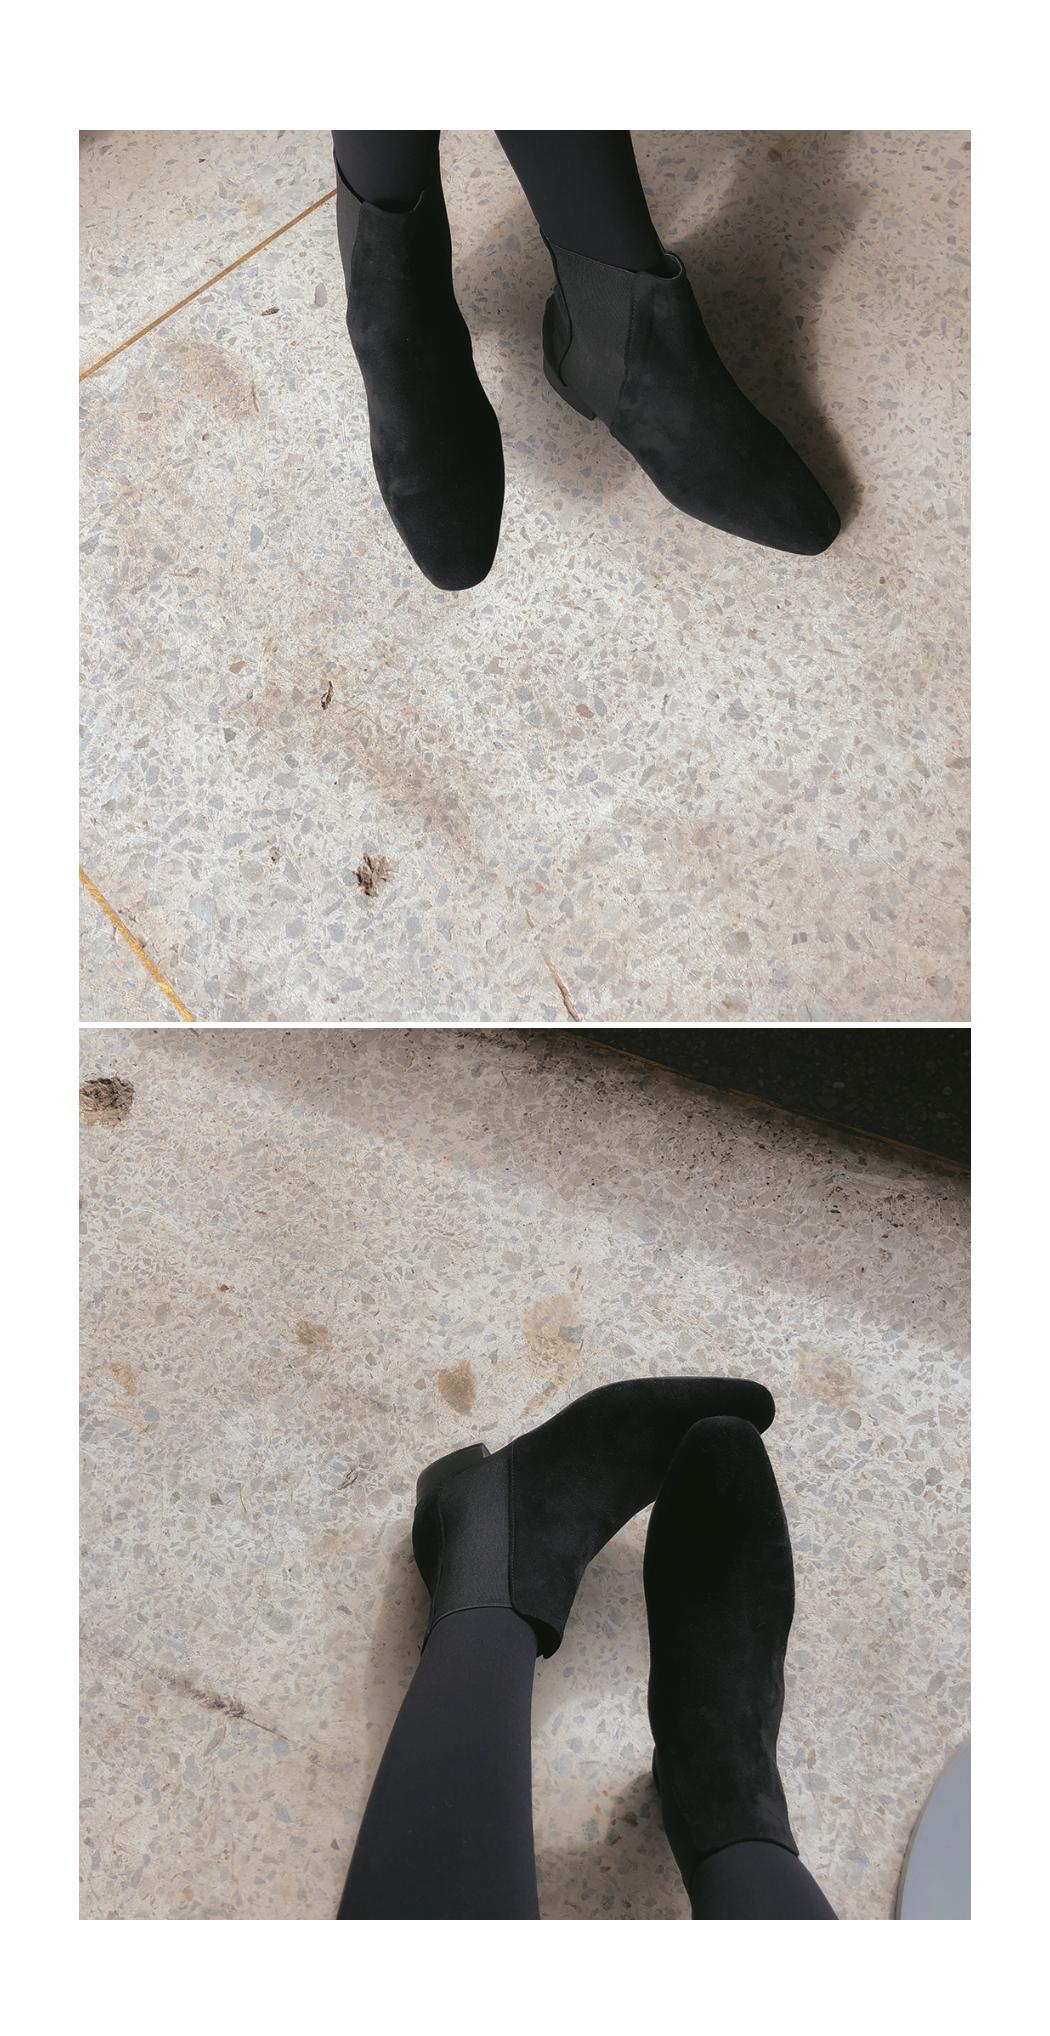 Question- Chelsea boots